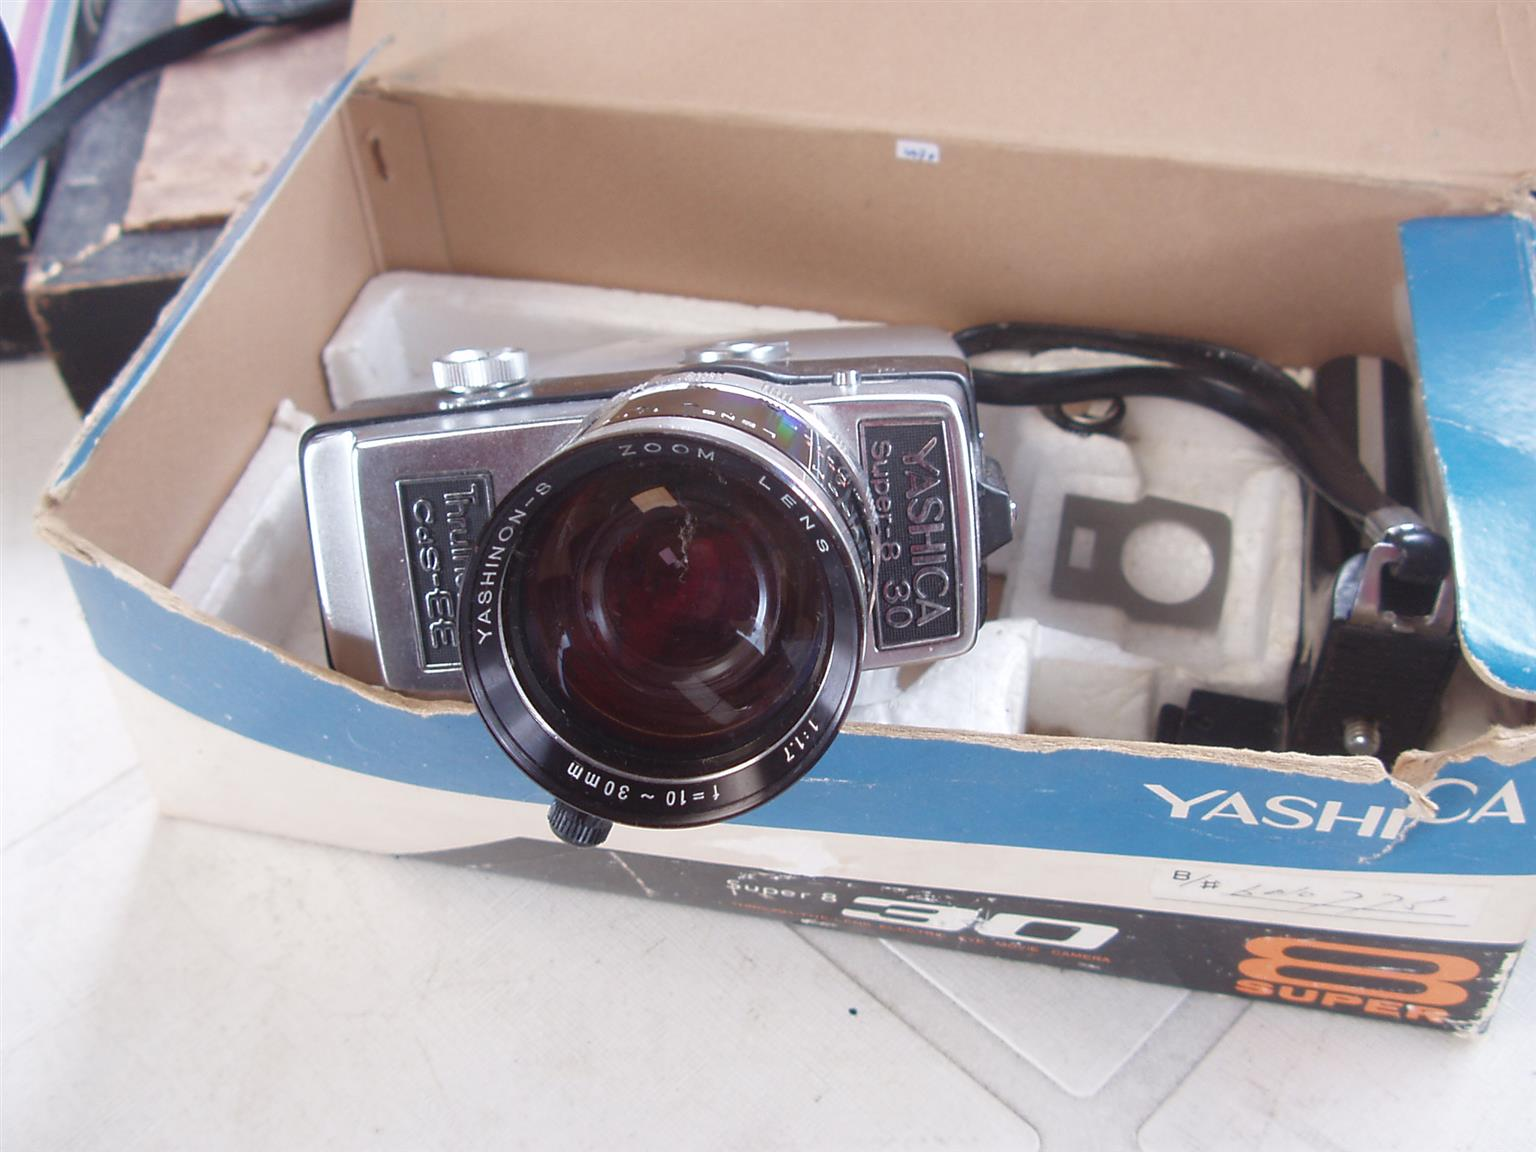 Vintage Yashica Super 8 30 retro vintage super 8 kodak 8mm movie cine film camera- in original box